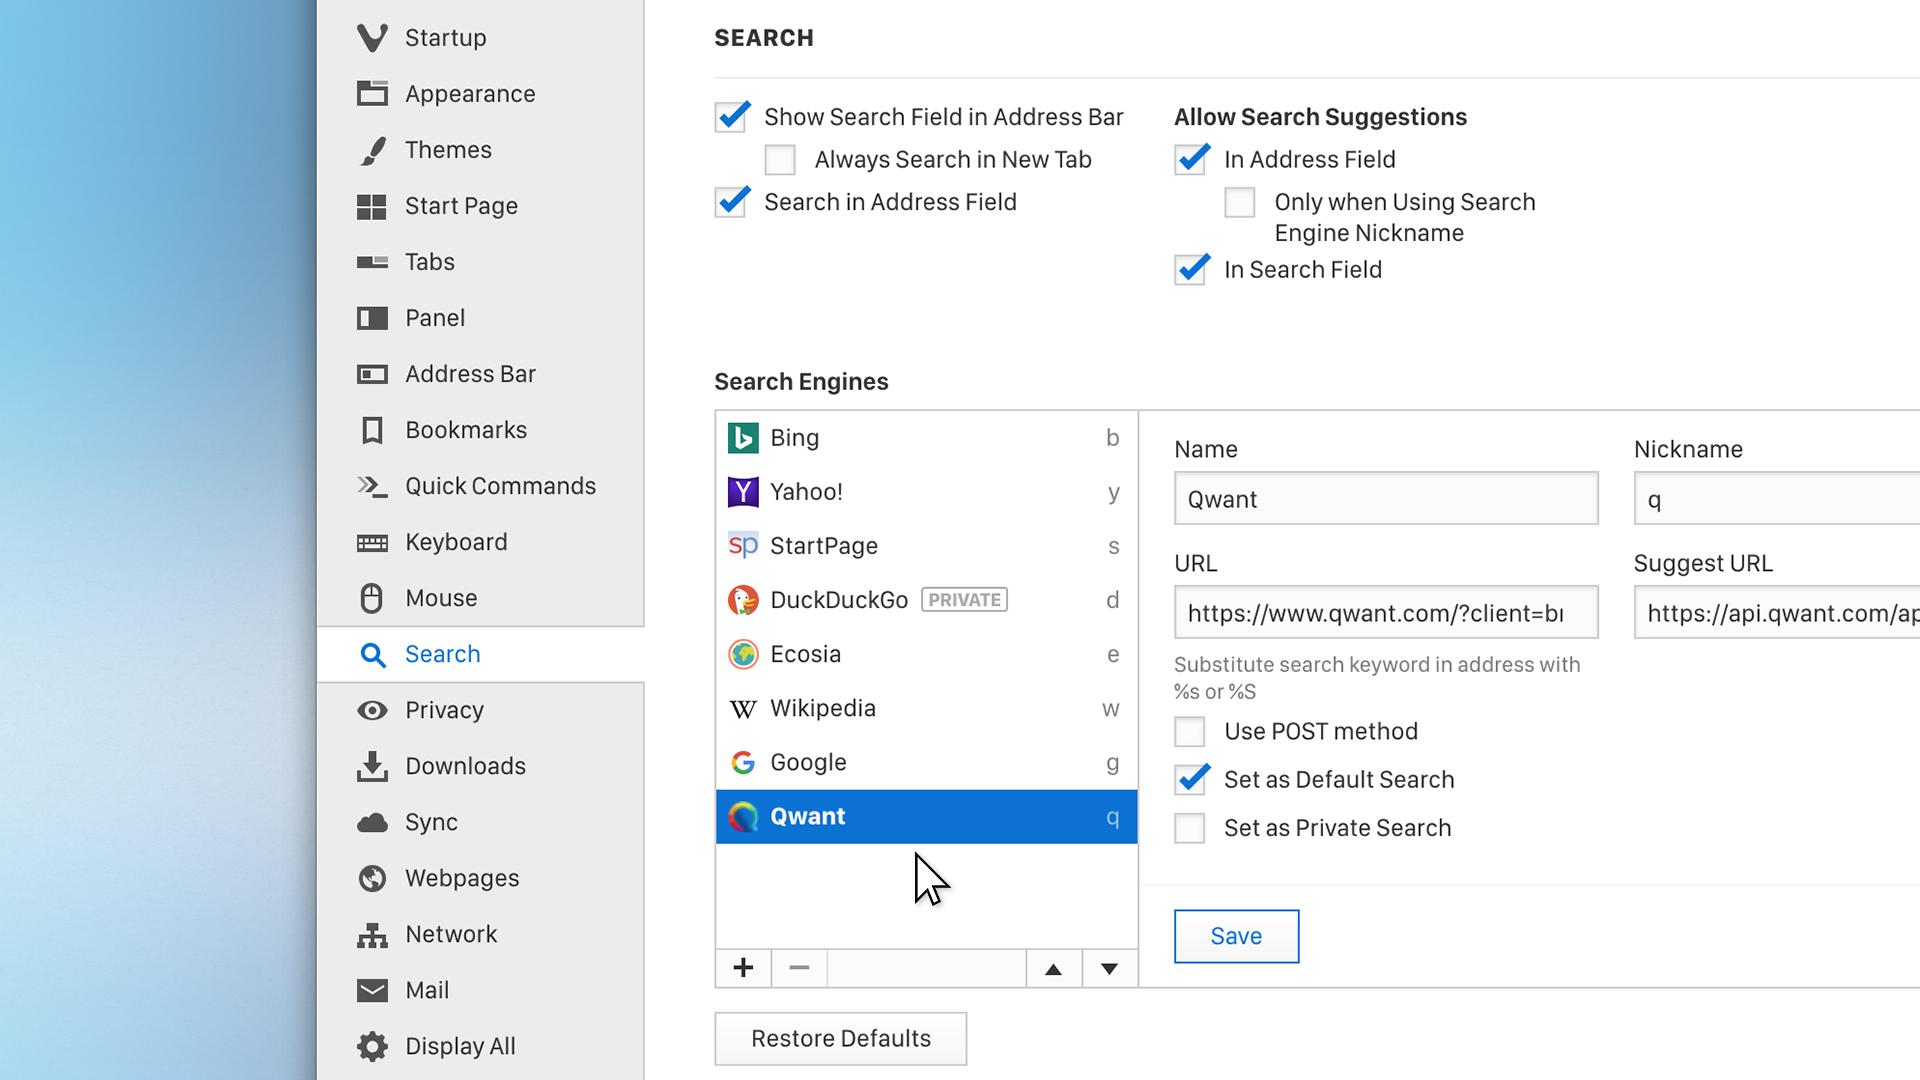 Vivaldi Search Settings